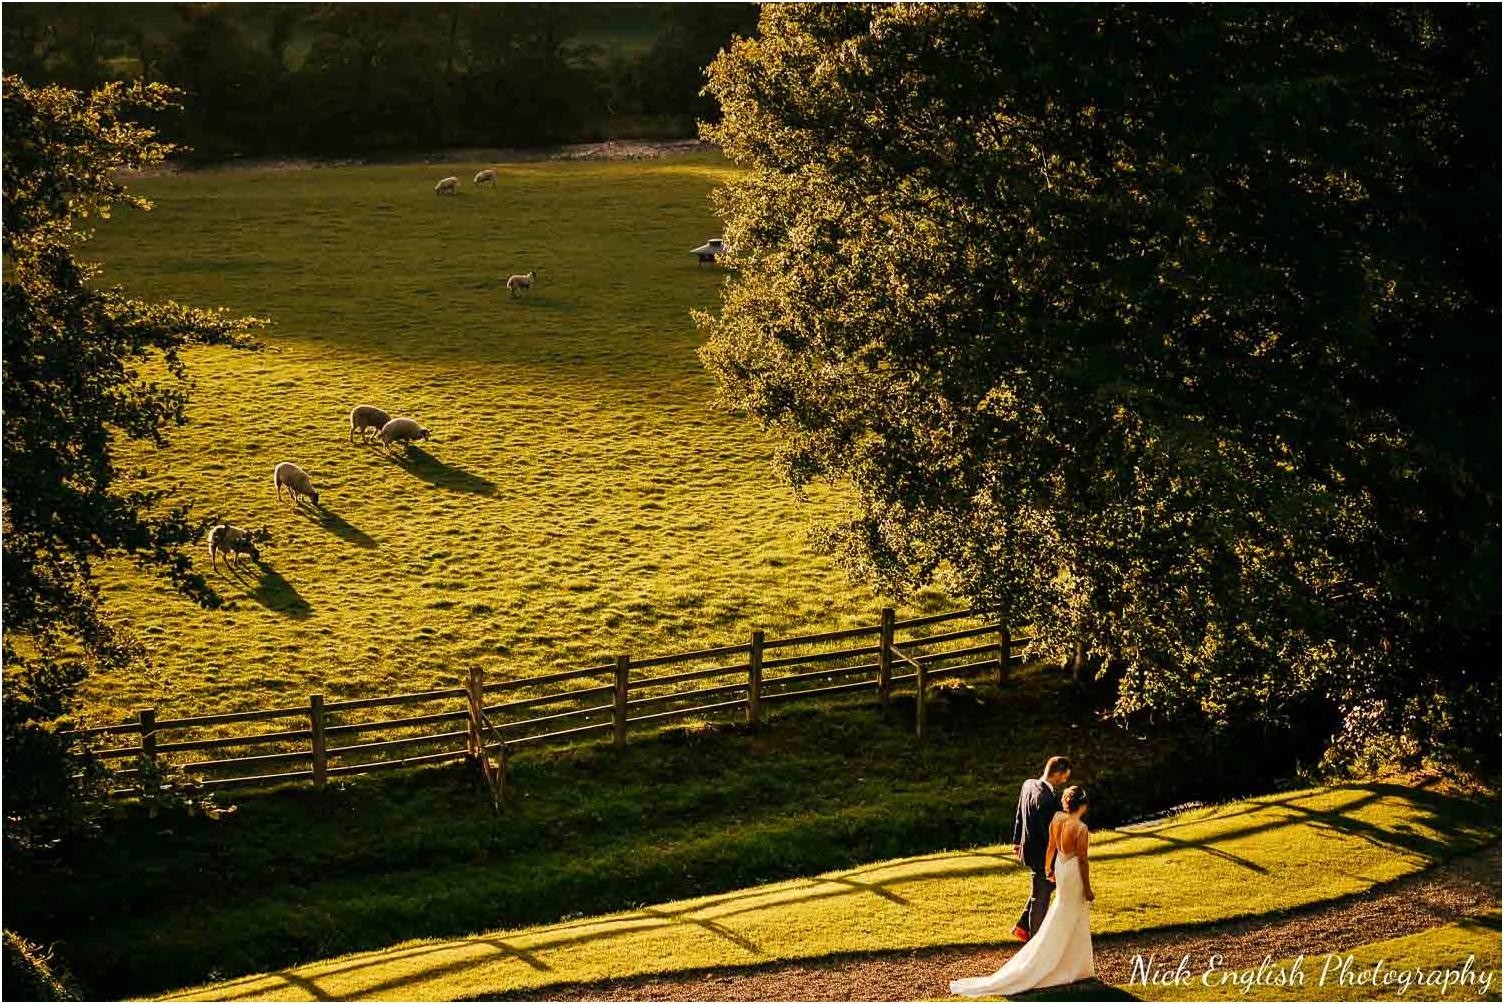 Mitton_Hall_Wedding_Summer_Photograph-121.jpg